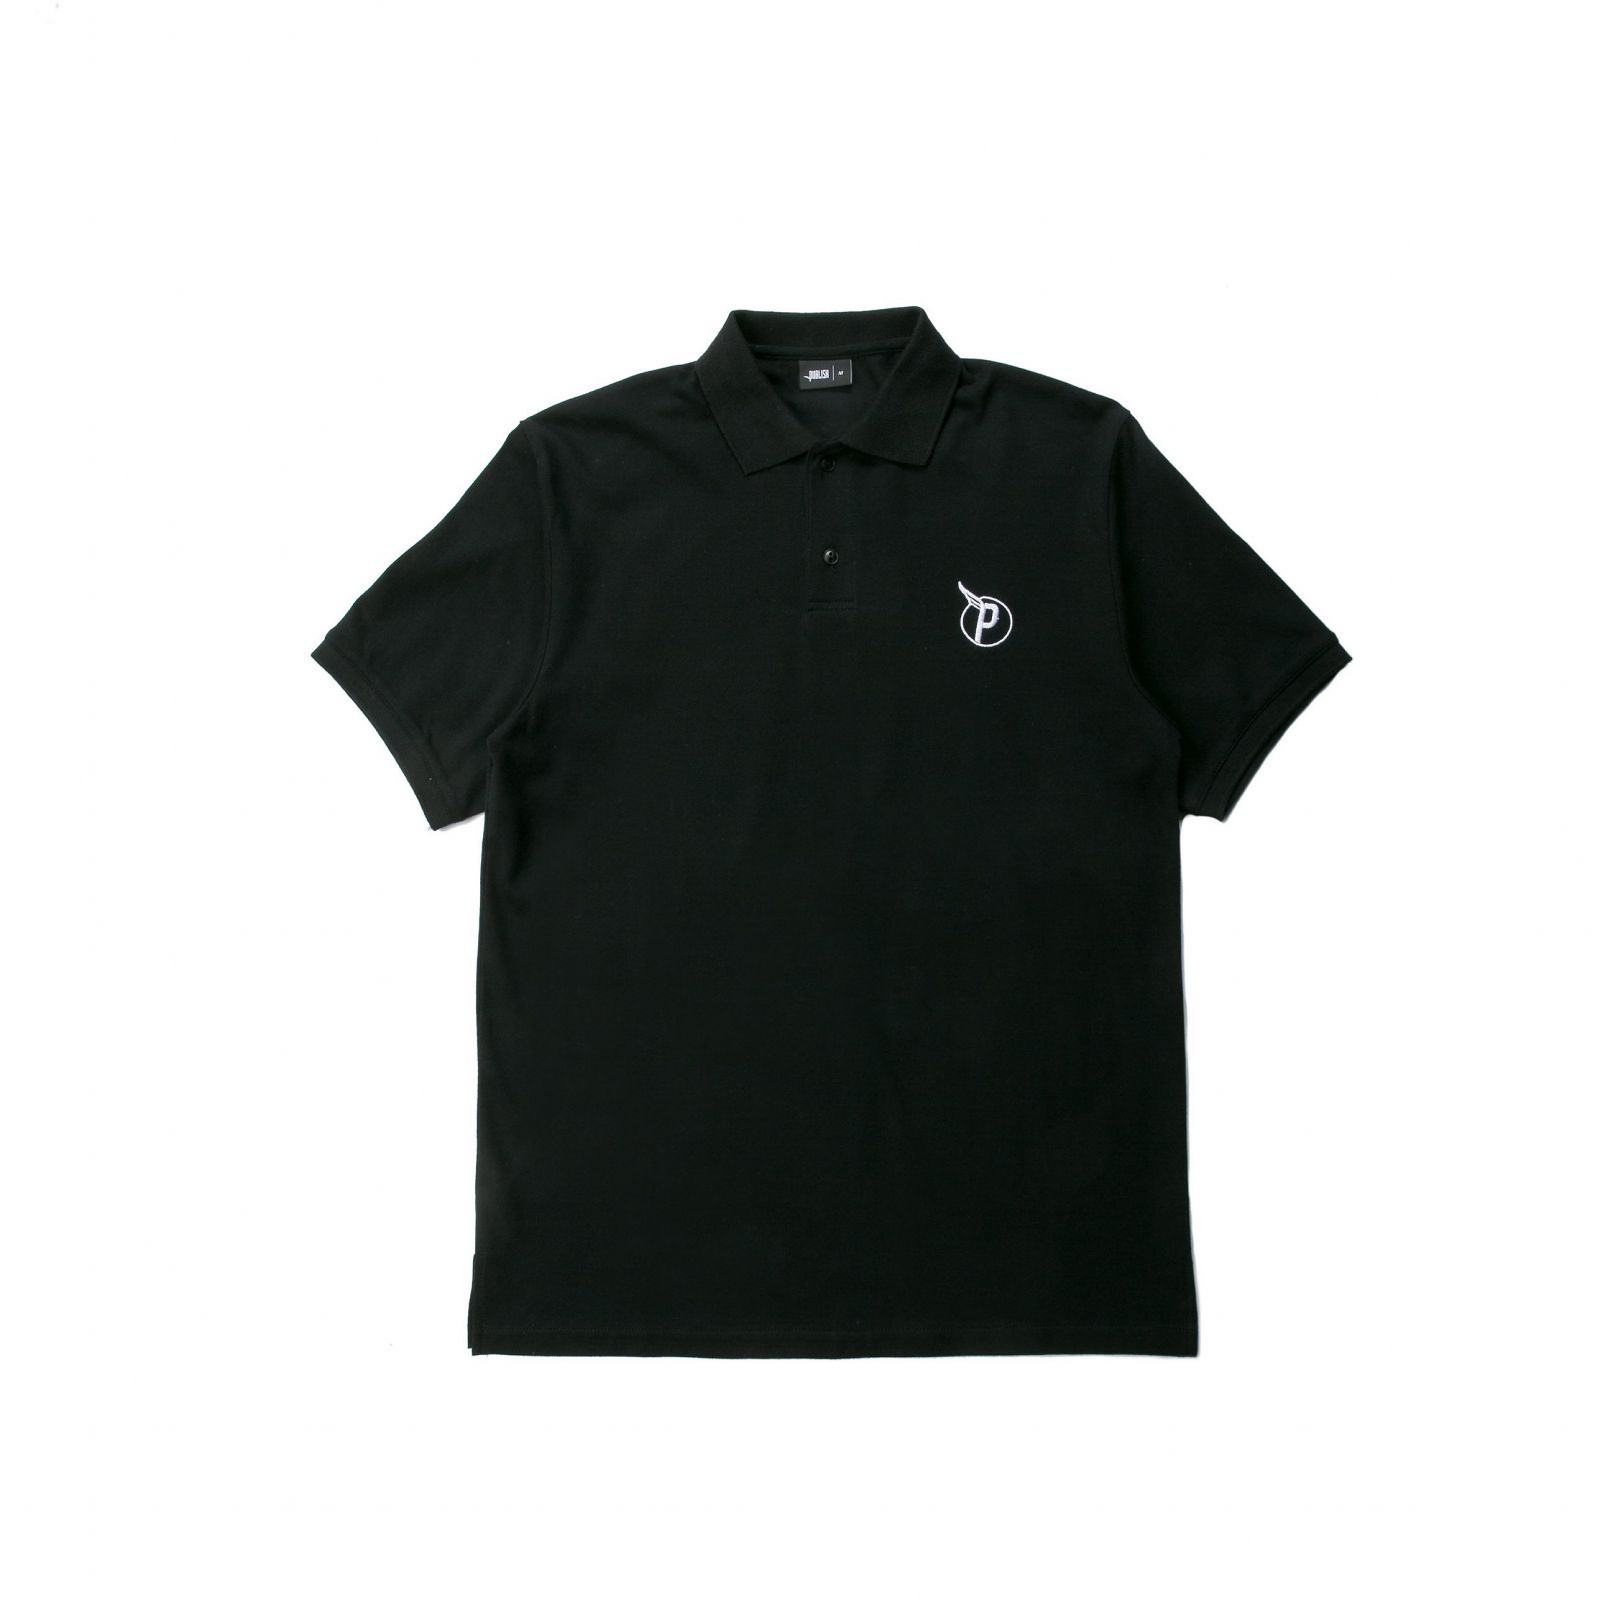 【PUBLISH BRAND/パブリッシュブランド】PRESS ポロシャツ / BLACK